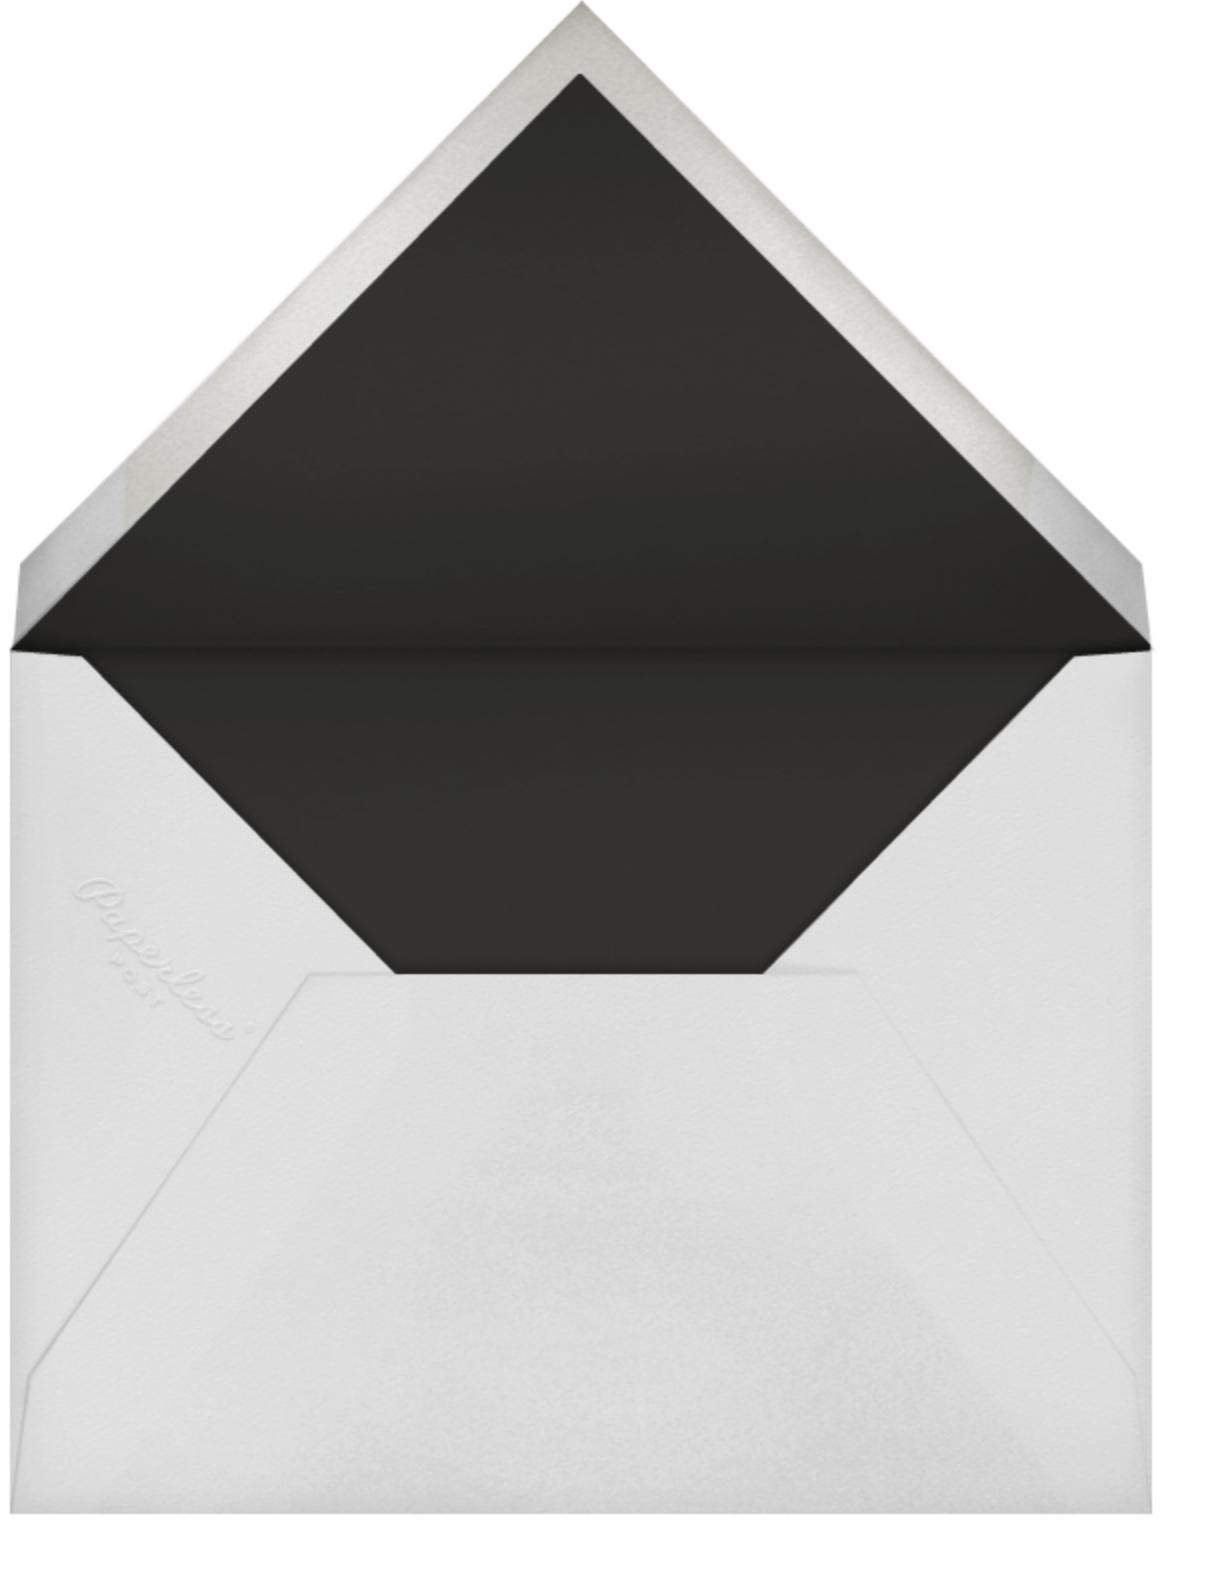 Richmond Park (Invitation) - Pink/Gold - Oscar de la Renta - All - envelope back